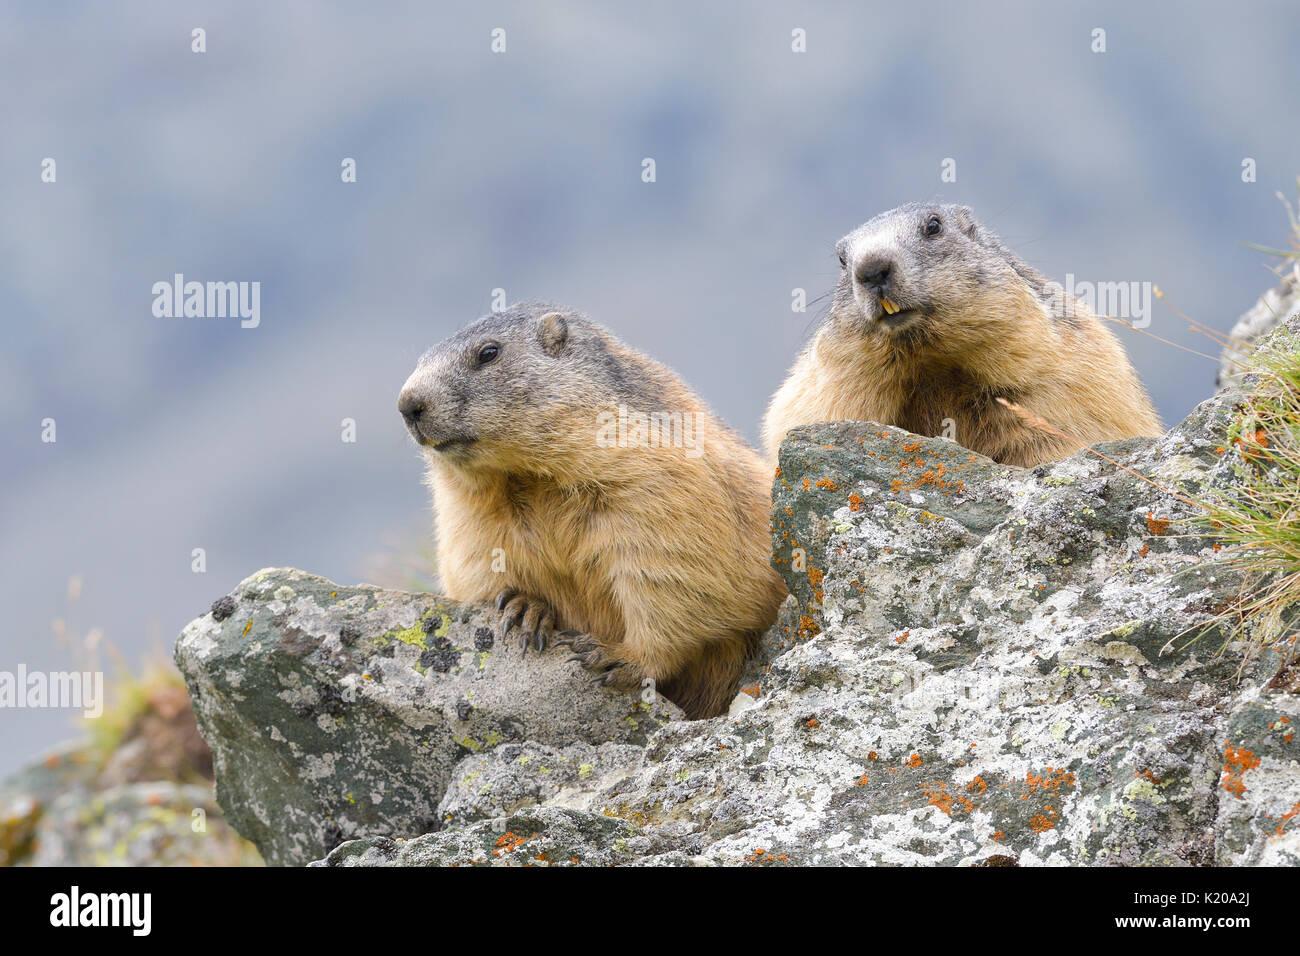 Alpine Marmots (Marmota marmota) on rocks, National Park Hohe Tauern, Carinthia, Austria - Stock Image